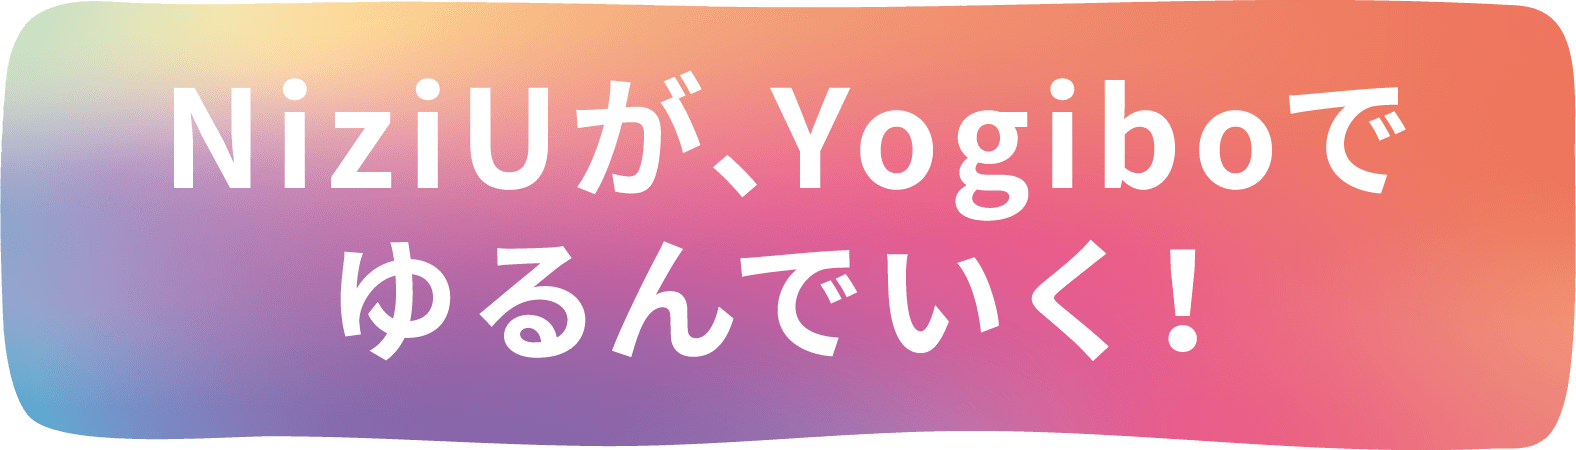 NiziUが、Yogiboでゆるんでいく!